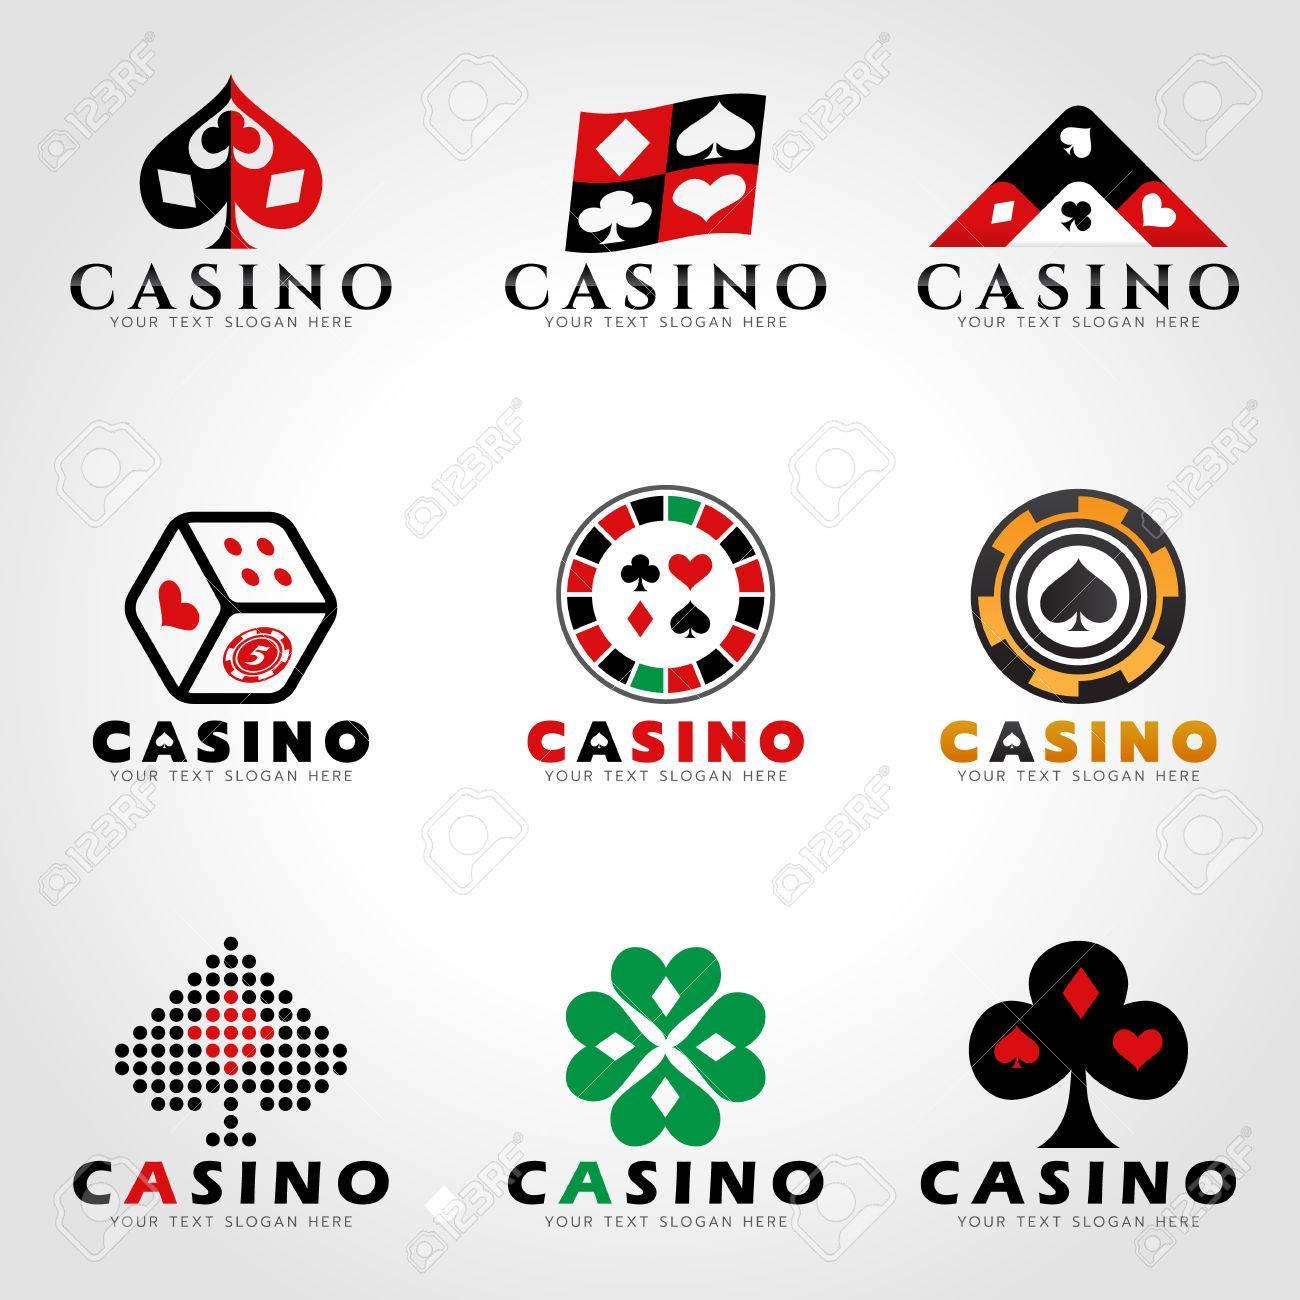 Логотип для i казино греция казино